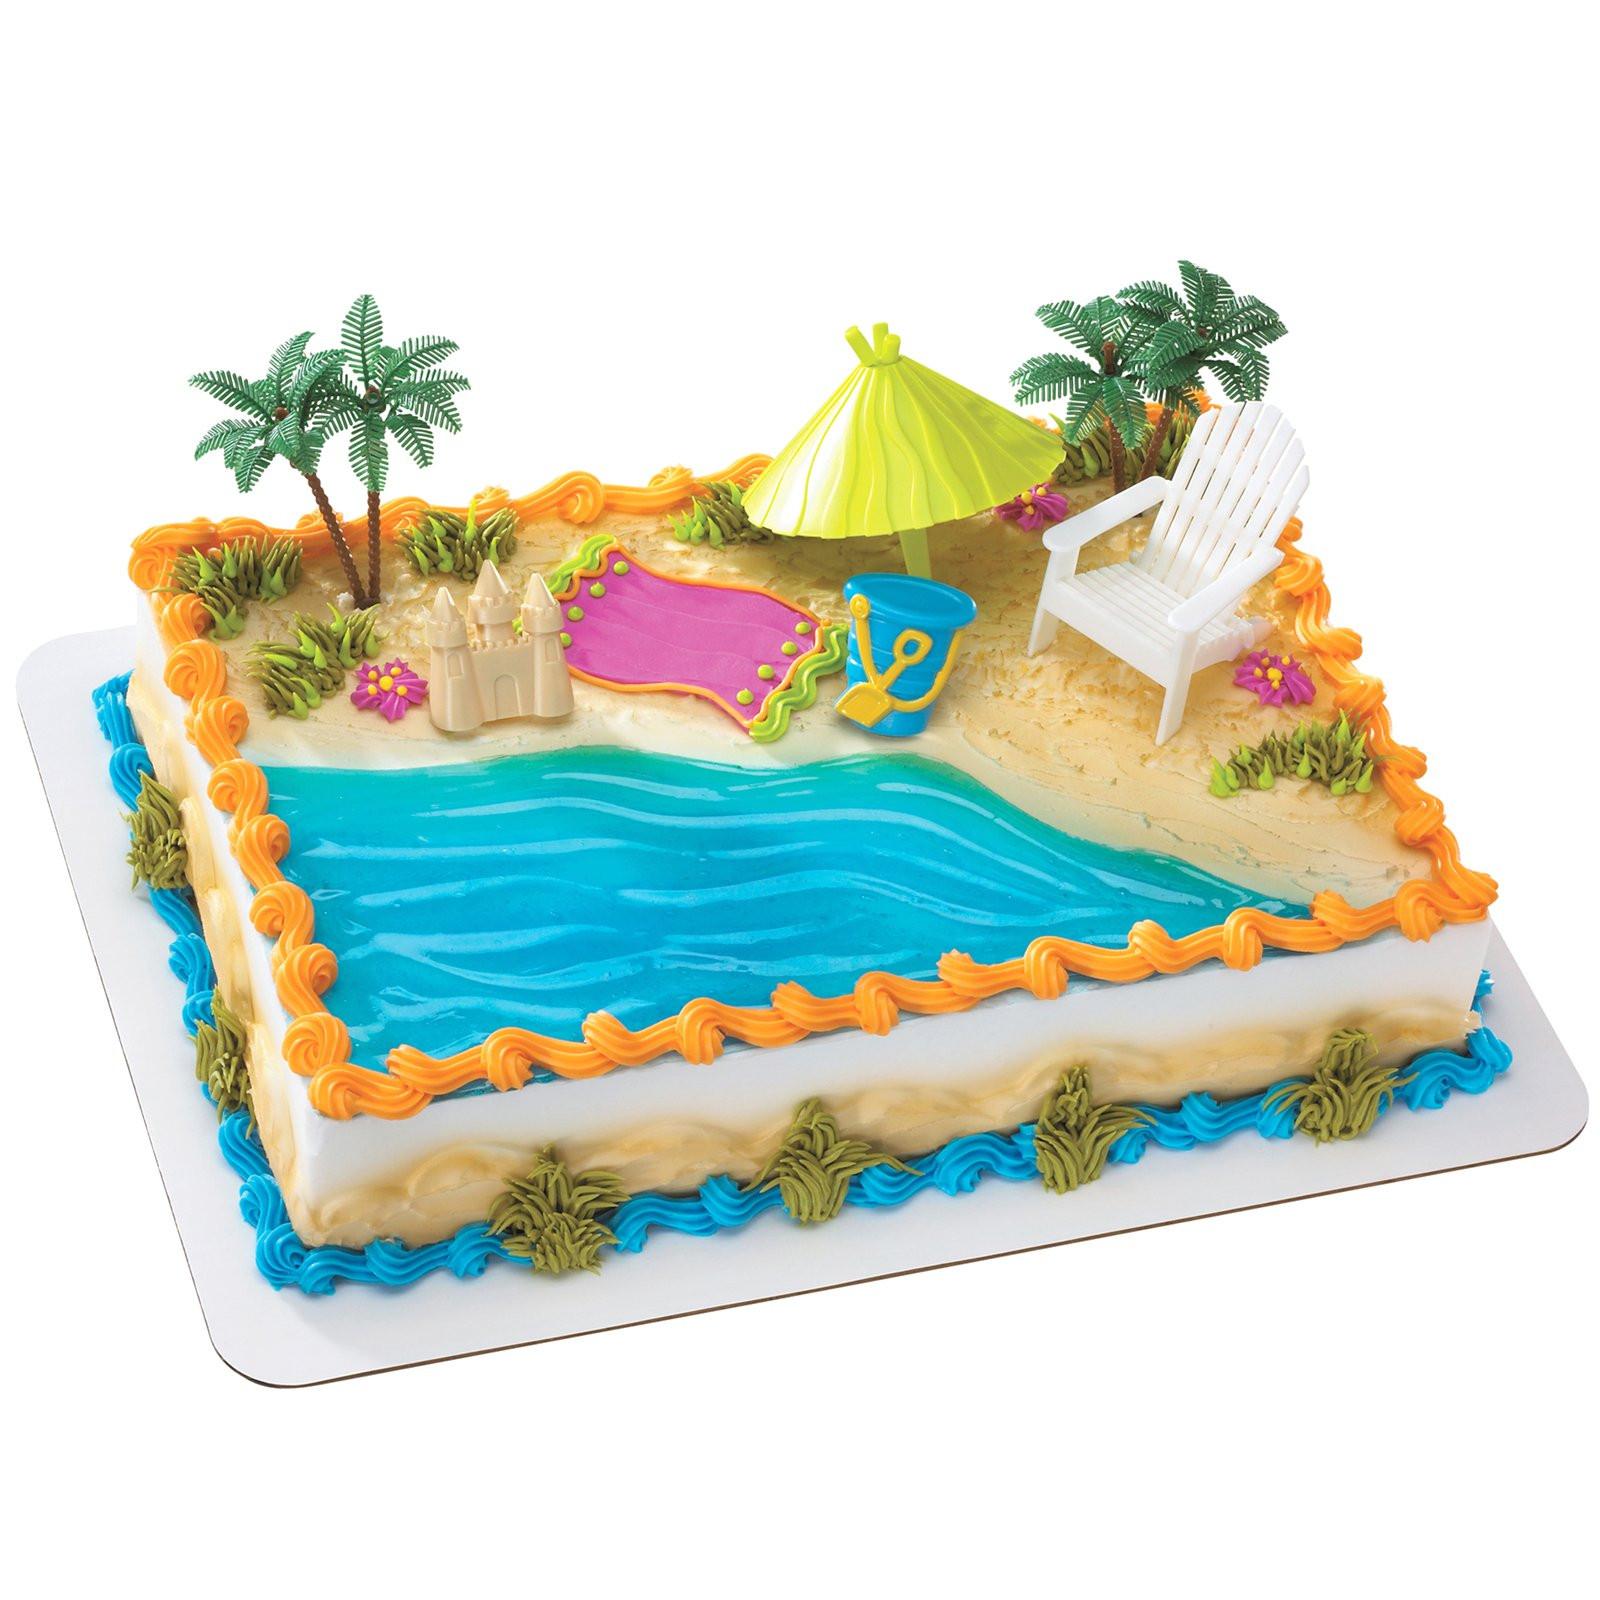 Beach Theme Birthday Cake  Celebrate Summer Birthdays with Birthdayexpress